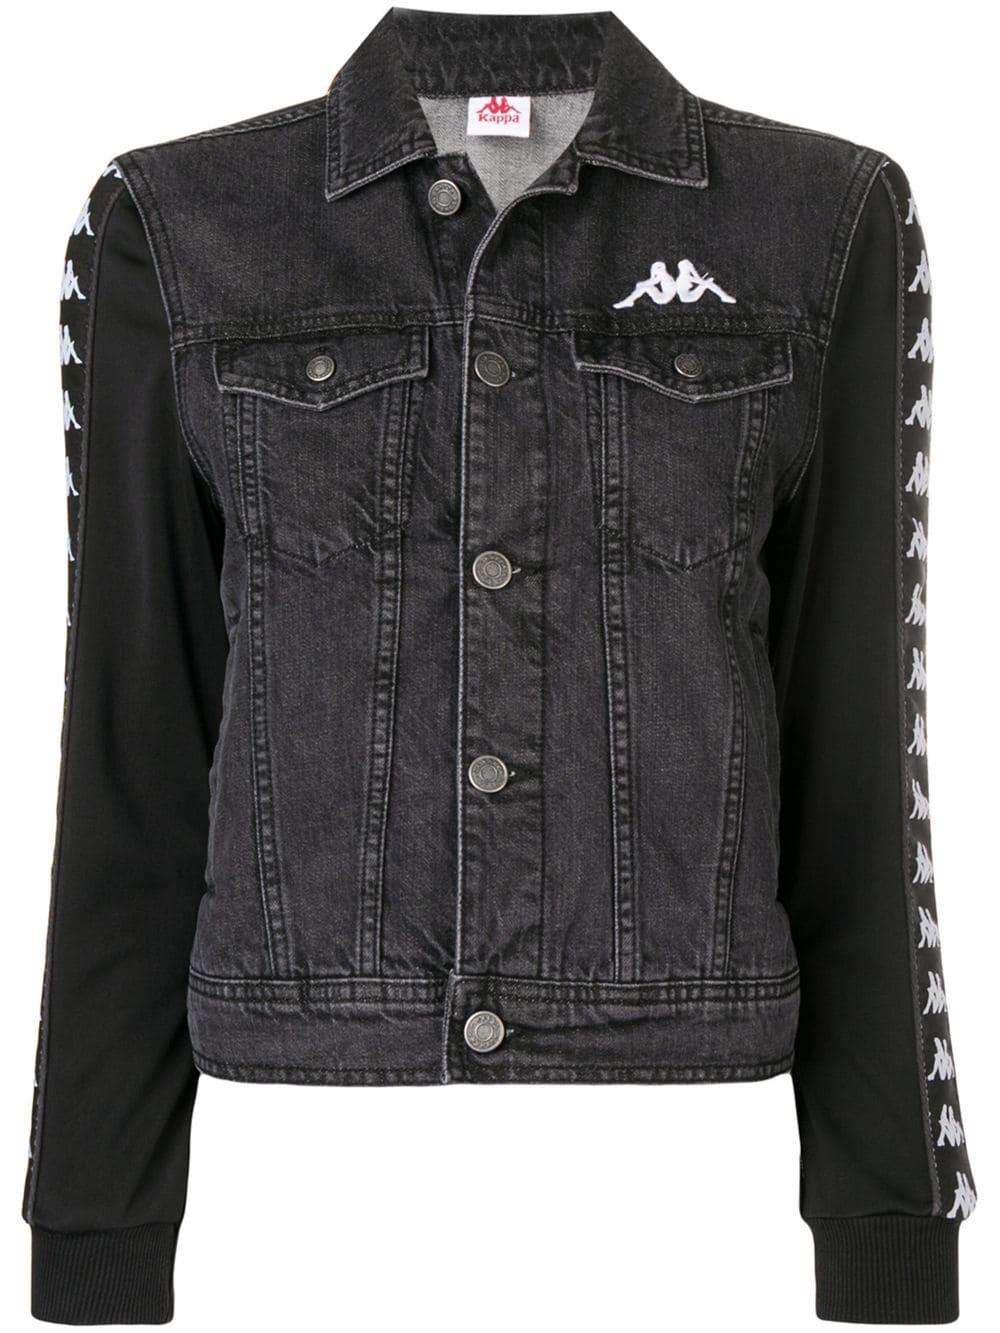 Kappa Logo Denim Jacket Farfetch Denim Jacket Jackets Denim [ 1333 x 1000 Pixel ]